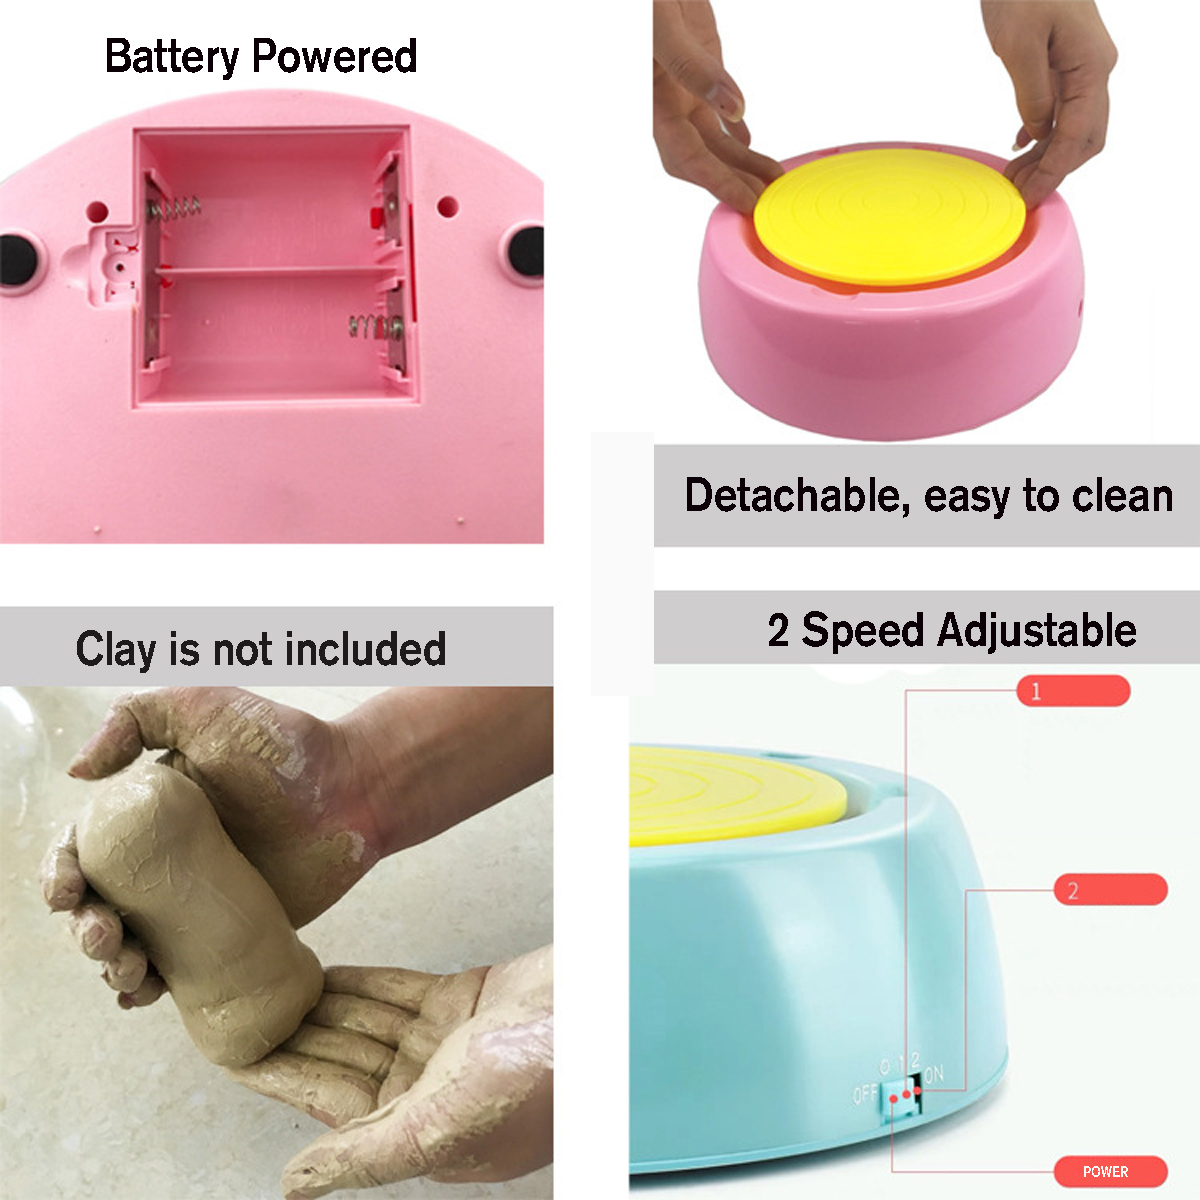 Electric Pottery Wheel Ceramic Machine Kids Diy Tools Diy Ceramic Art Tool Clay Making Toy Green Buy Online At Best Prices In Bangladesh Daraz Com Bd